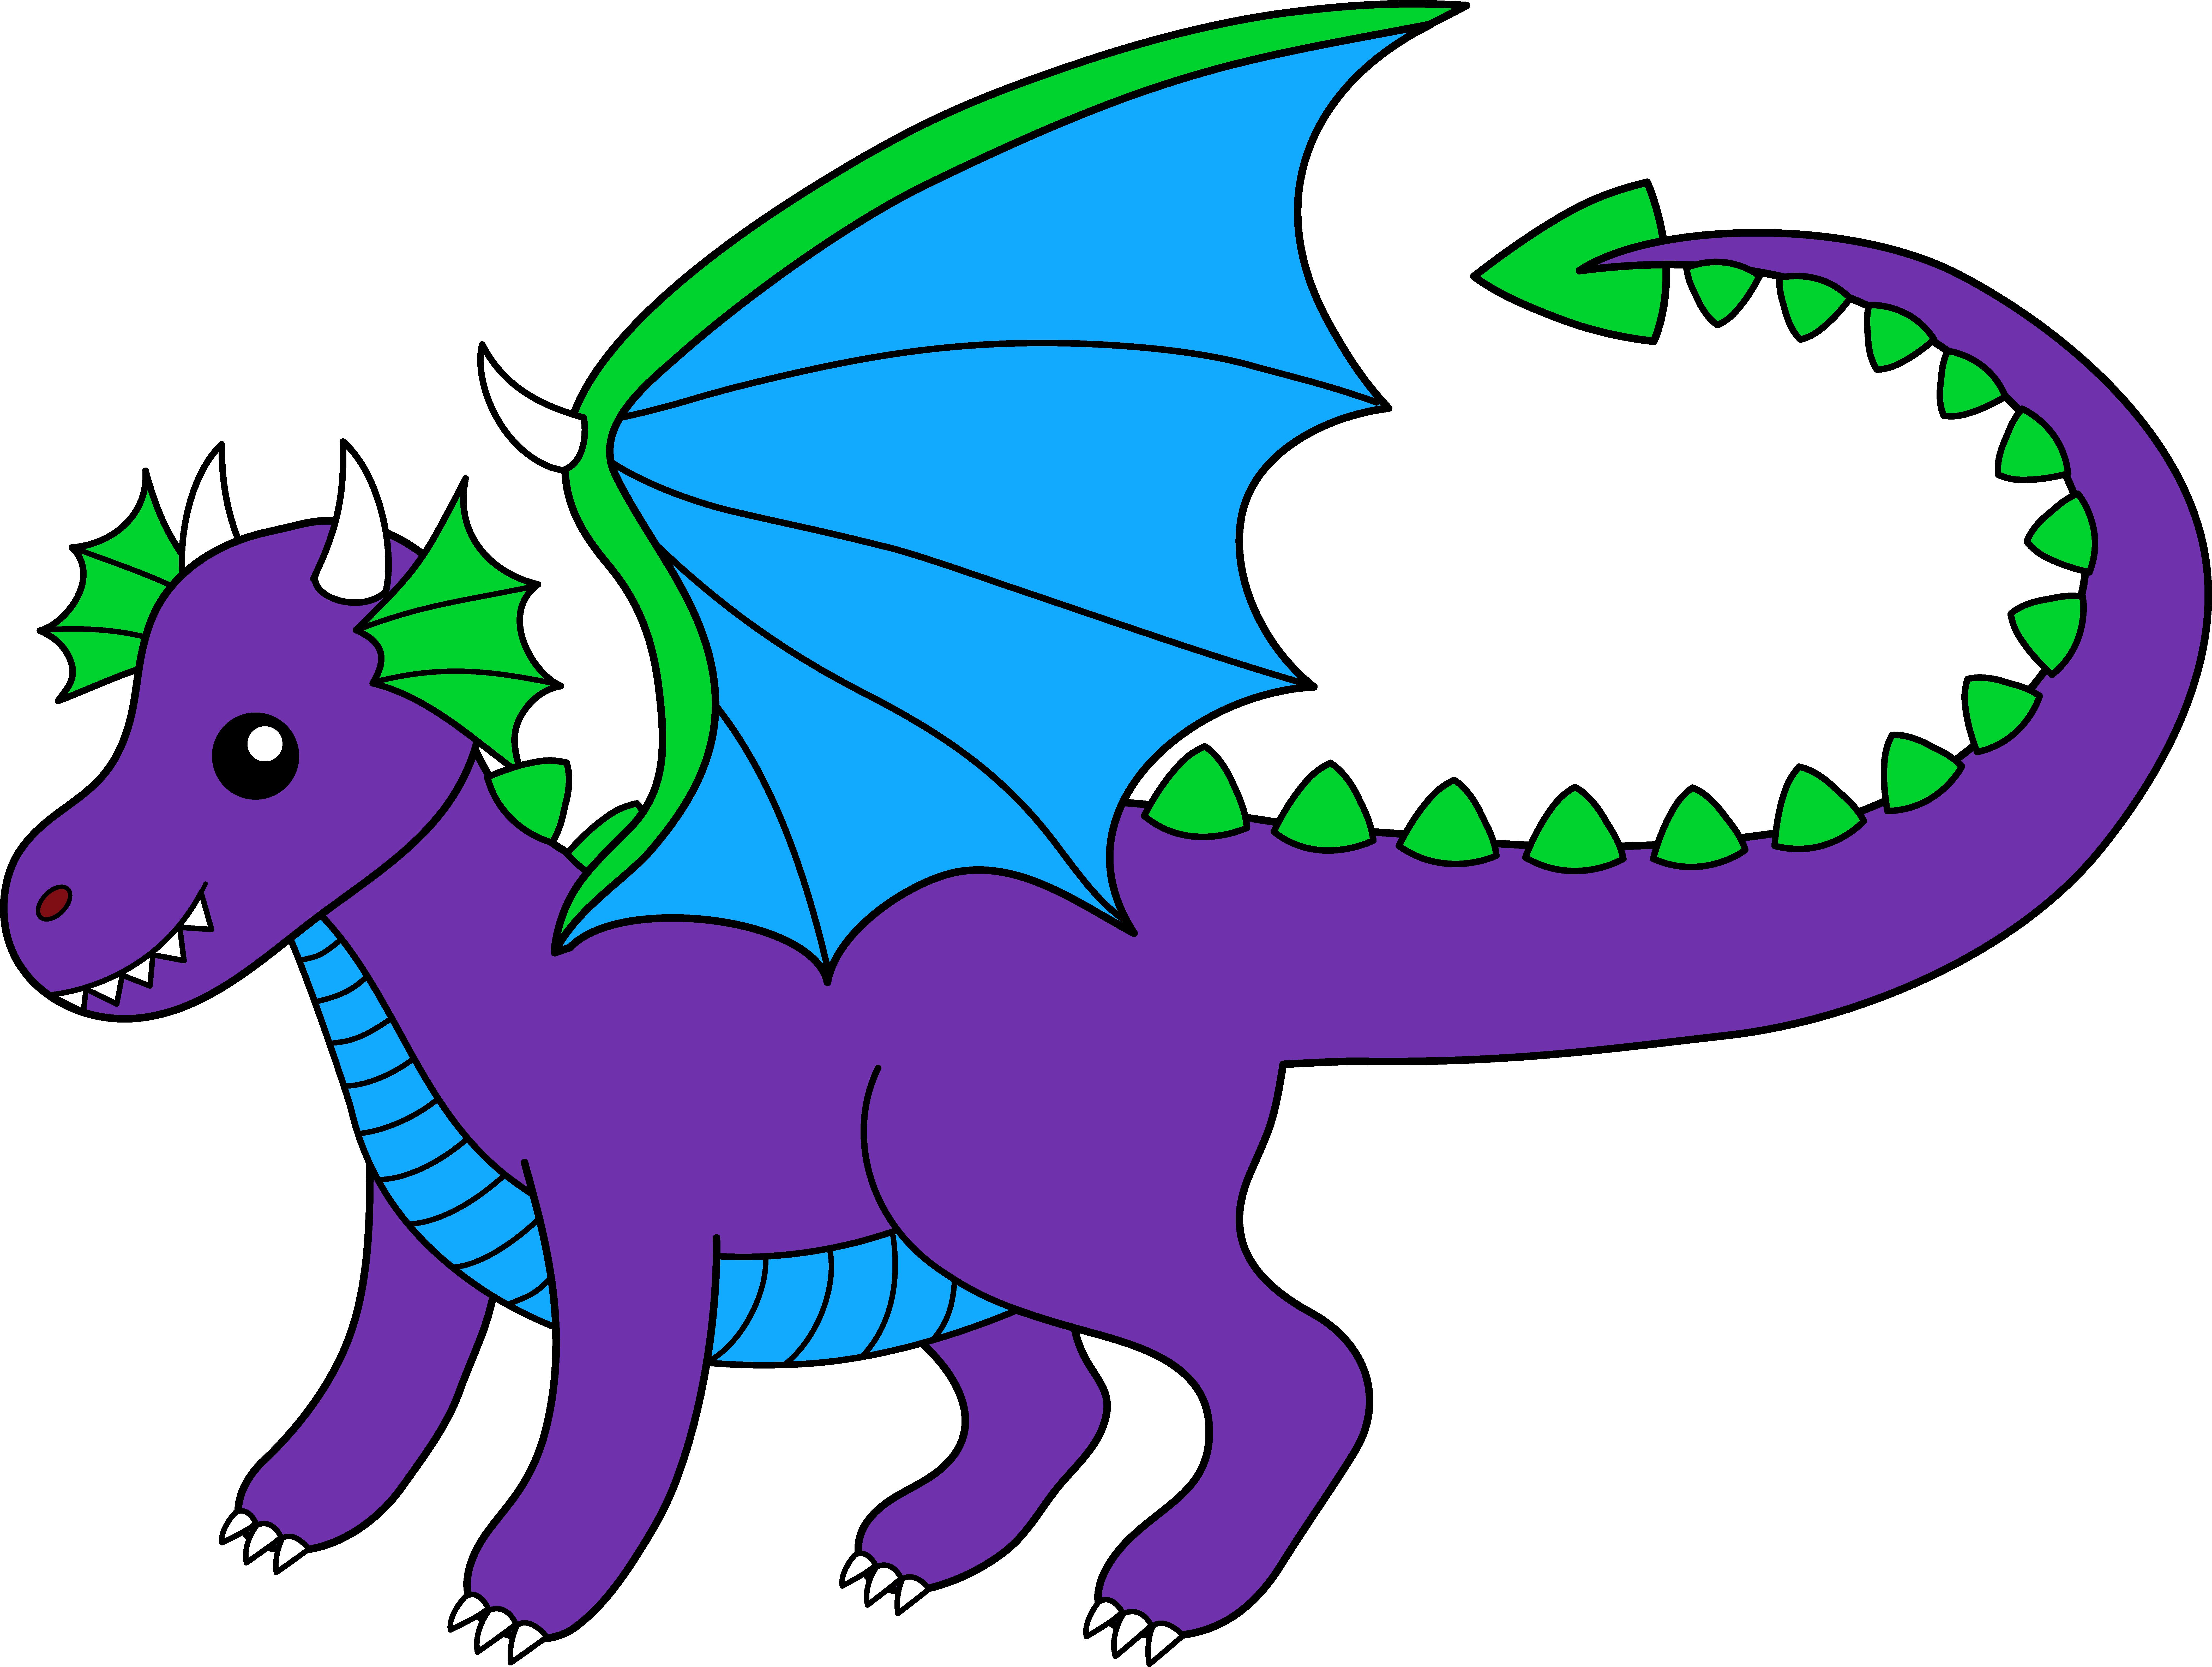 Free Cartoon Dragons Images, Download Free Clip Art, Free.